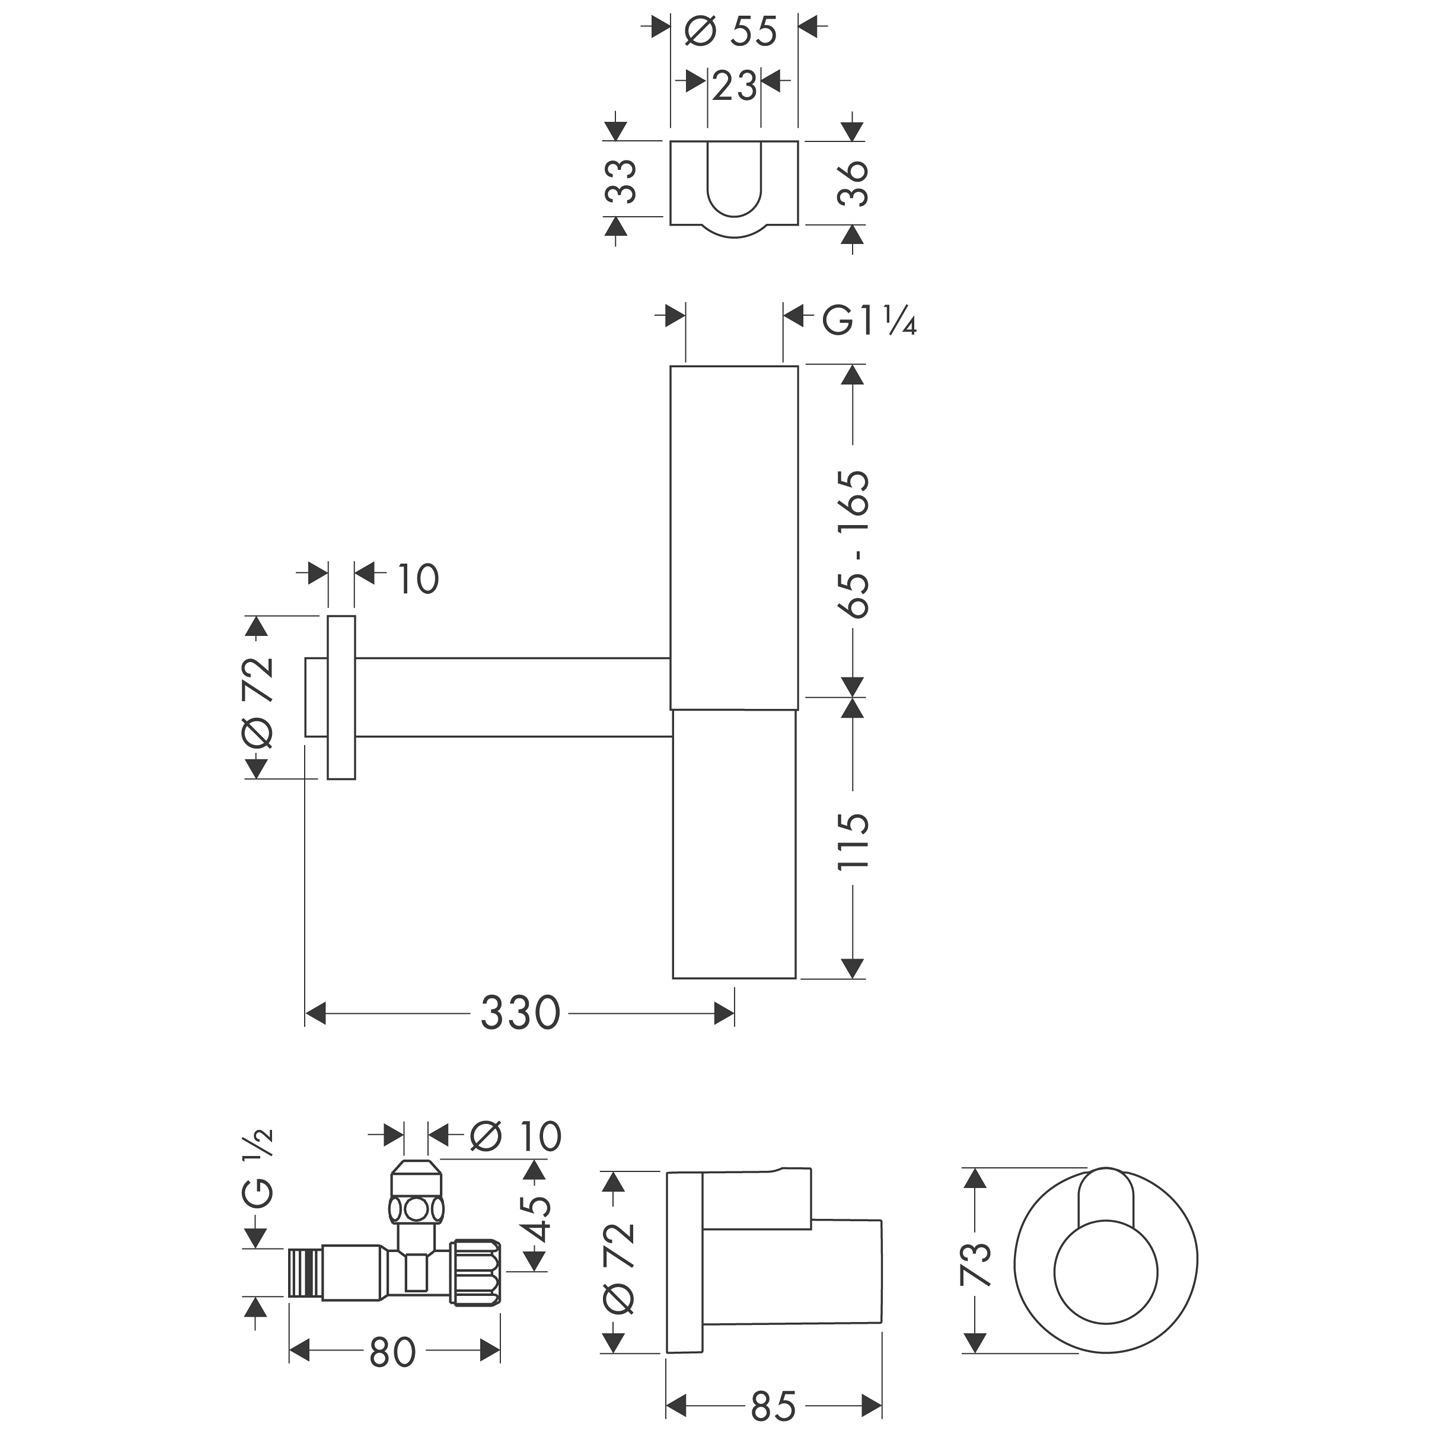 hansgrohe siphons eckventile designsifon flowstar set art nr 52120000 hansgrohe de. Black Bedroom Furniture Sets. Home Design Ideas